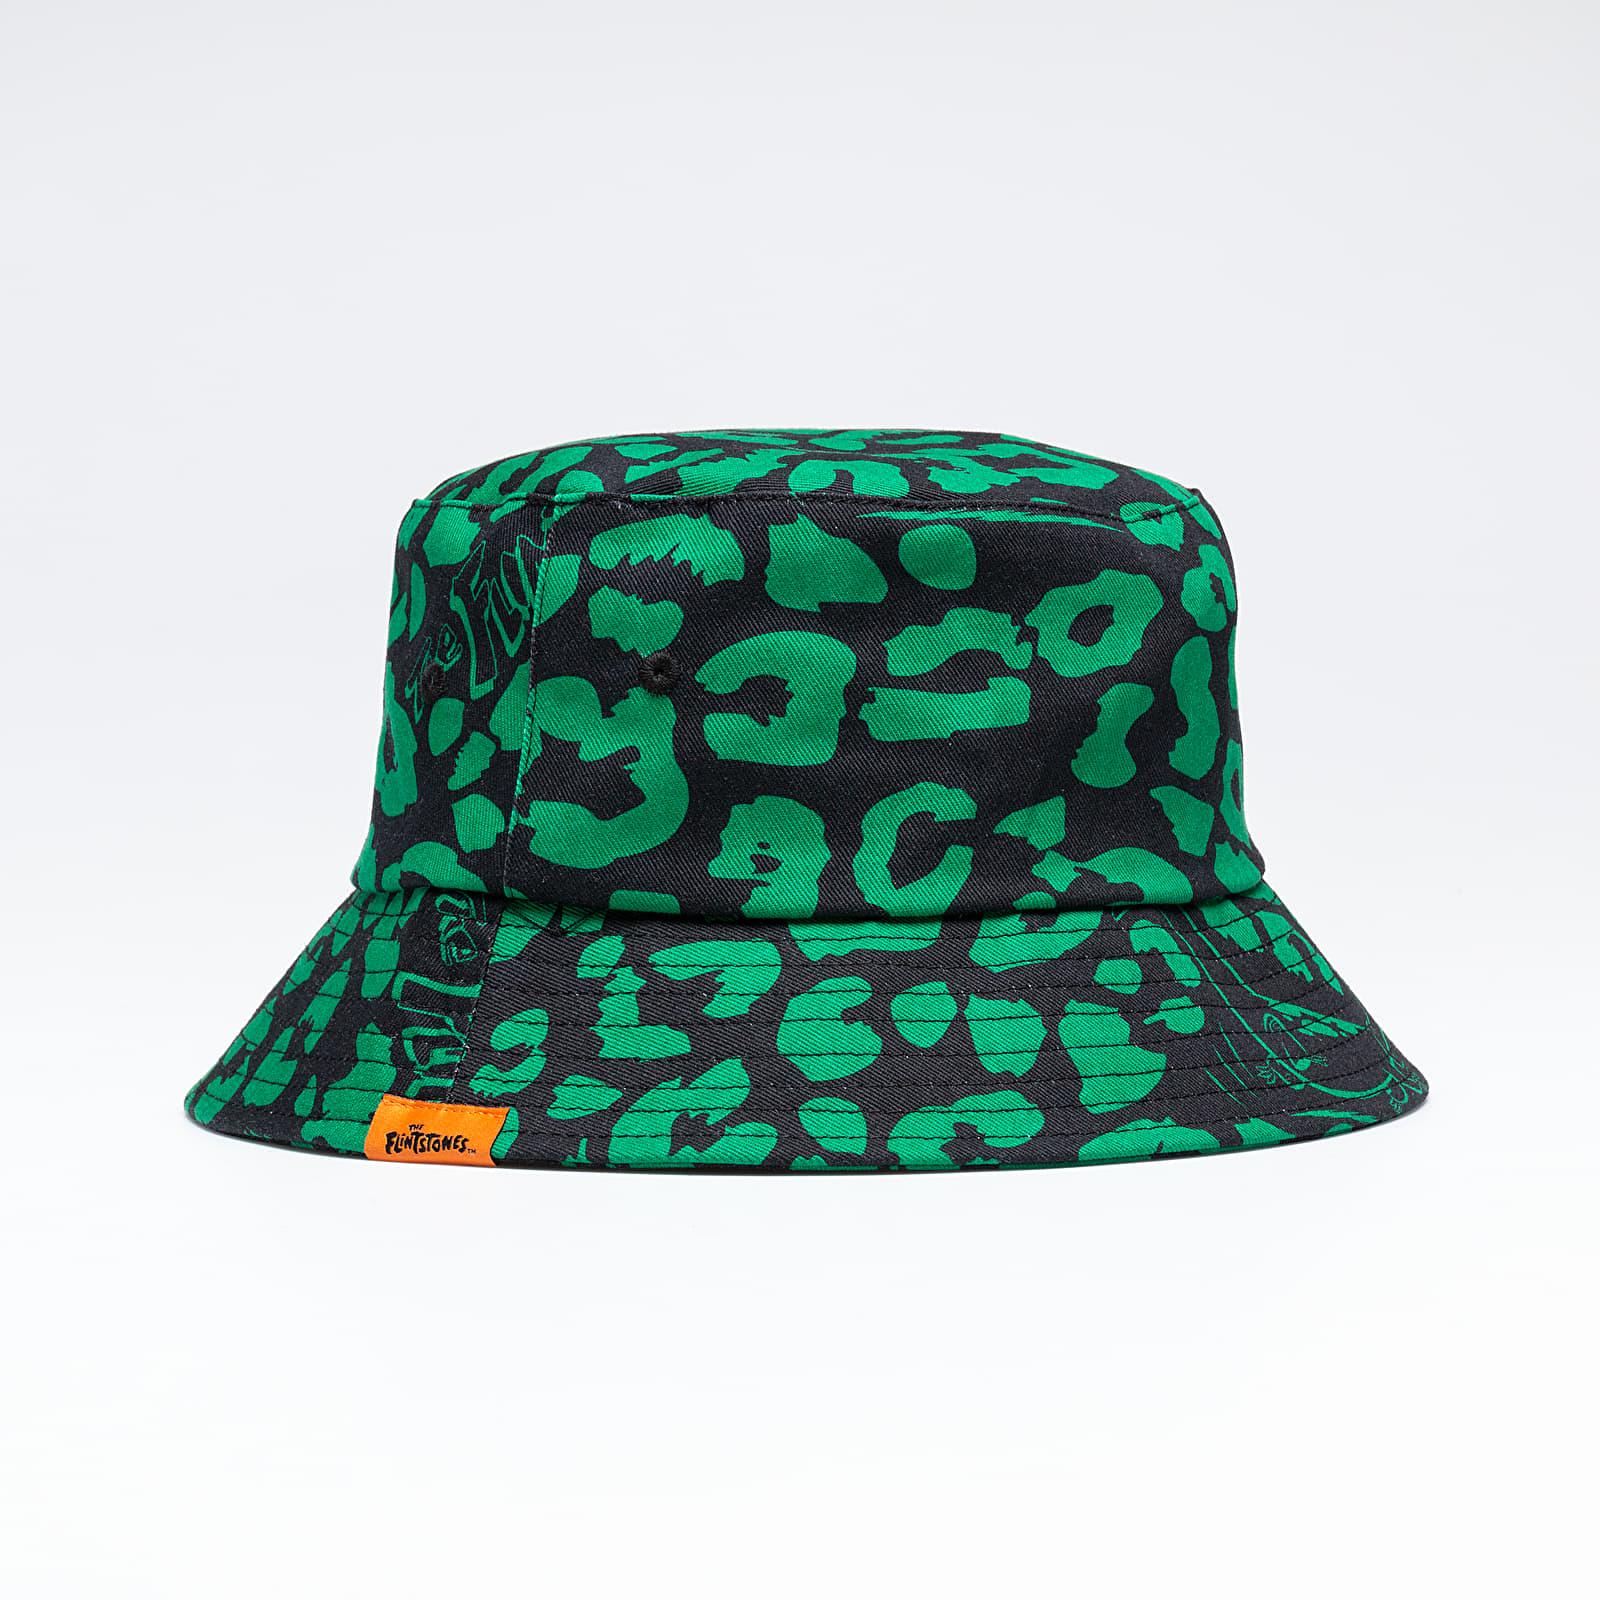 Lazy OAF x The Flinstones Dino Leopard Bucket Hat